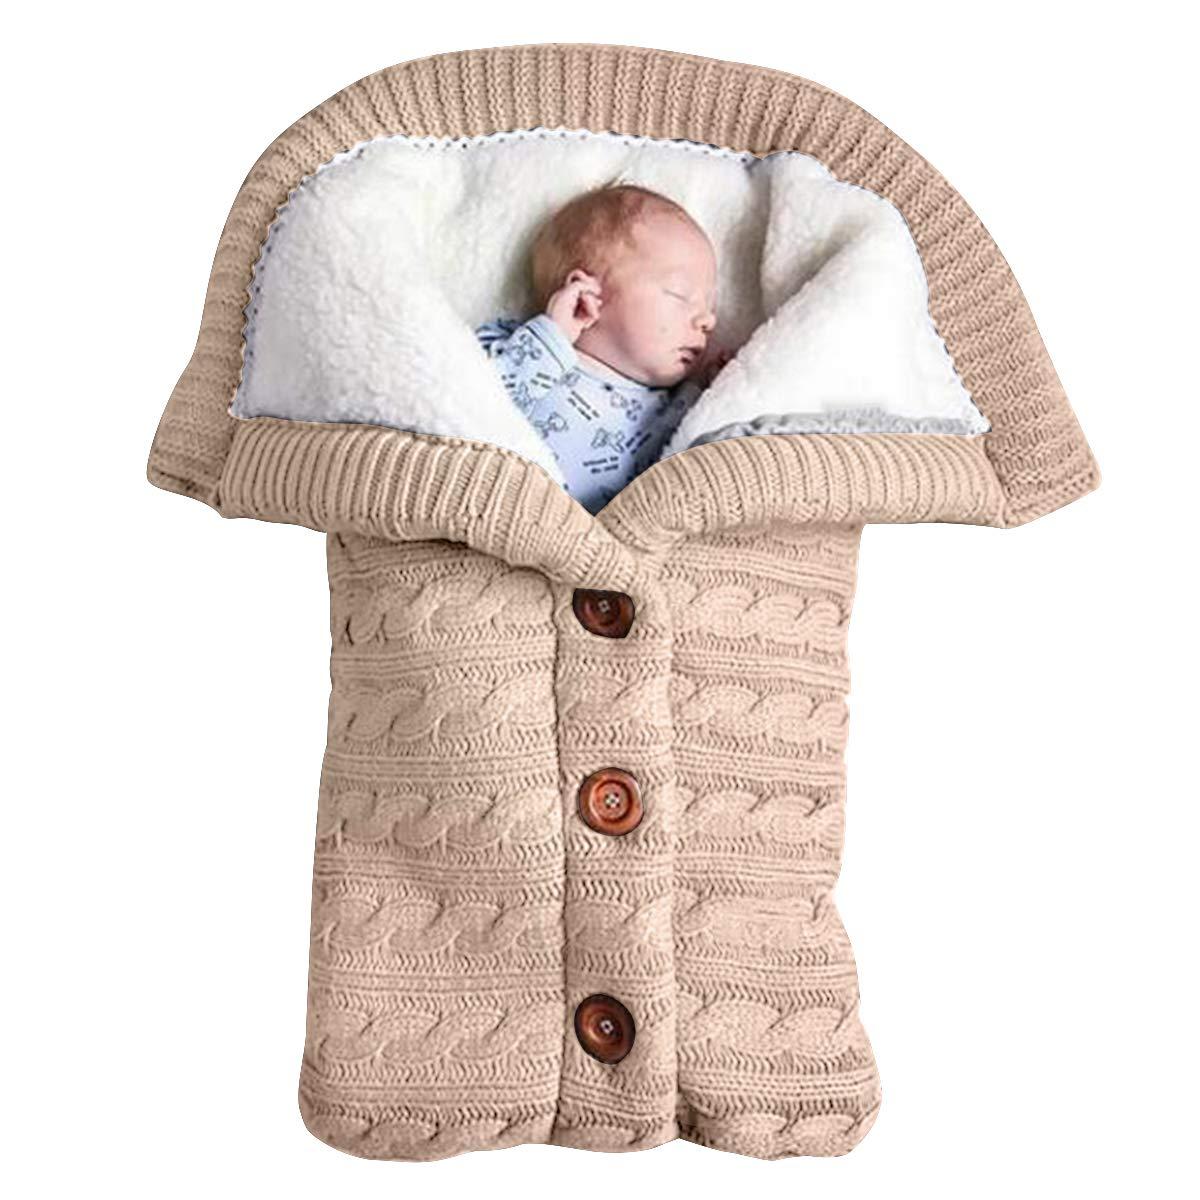 Newborn Baby Swaddle Blanket Fleece Stroller Wrap Nap